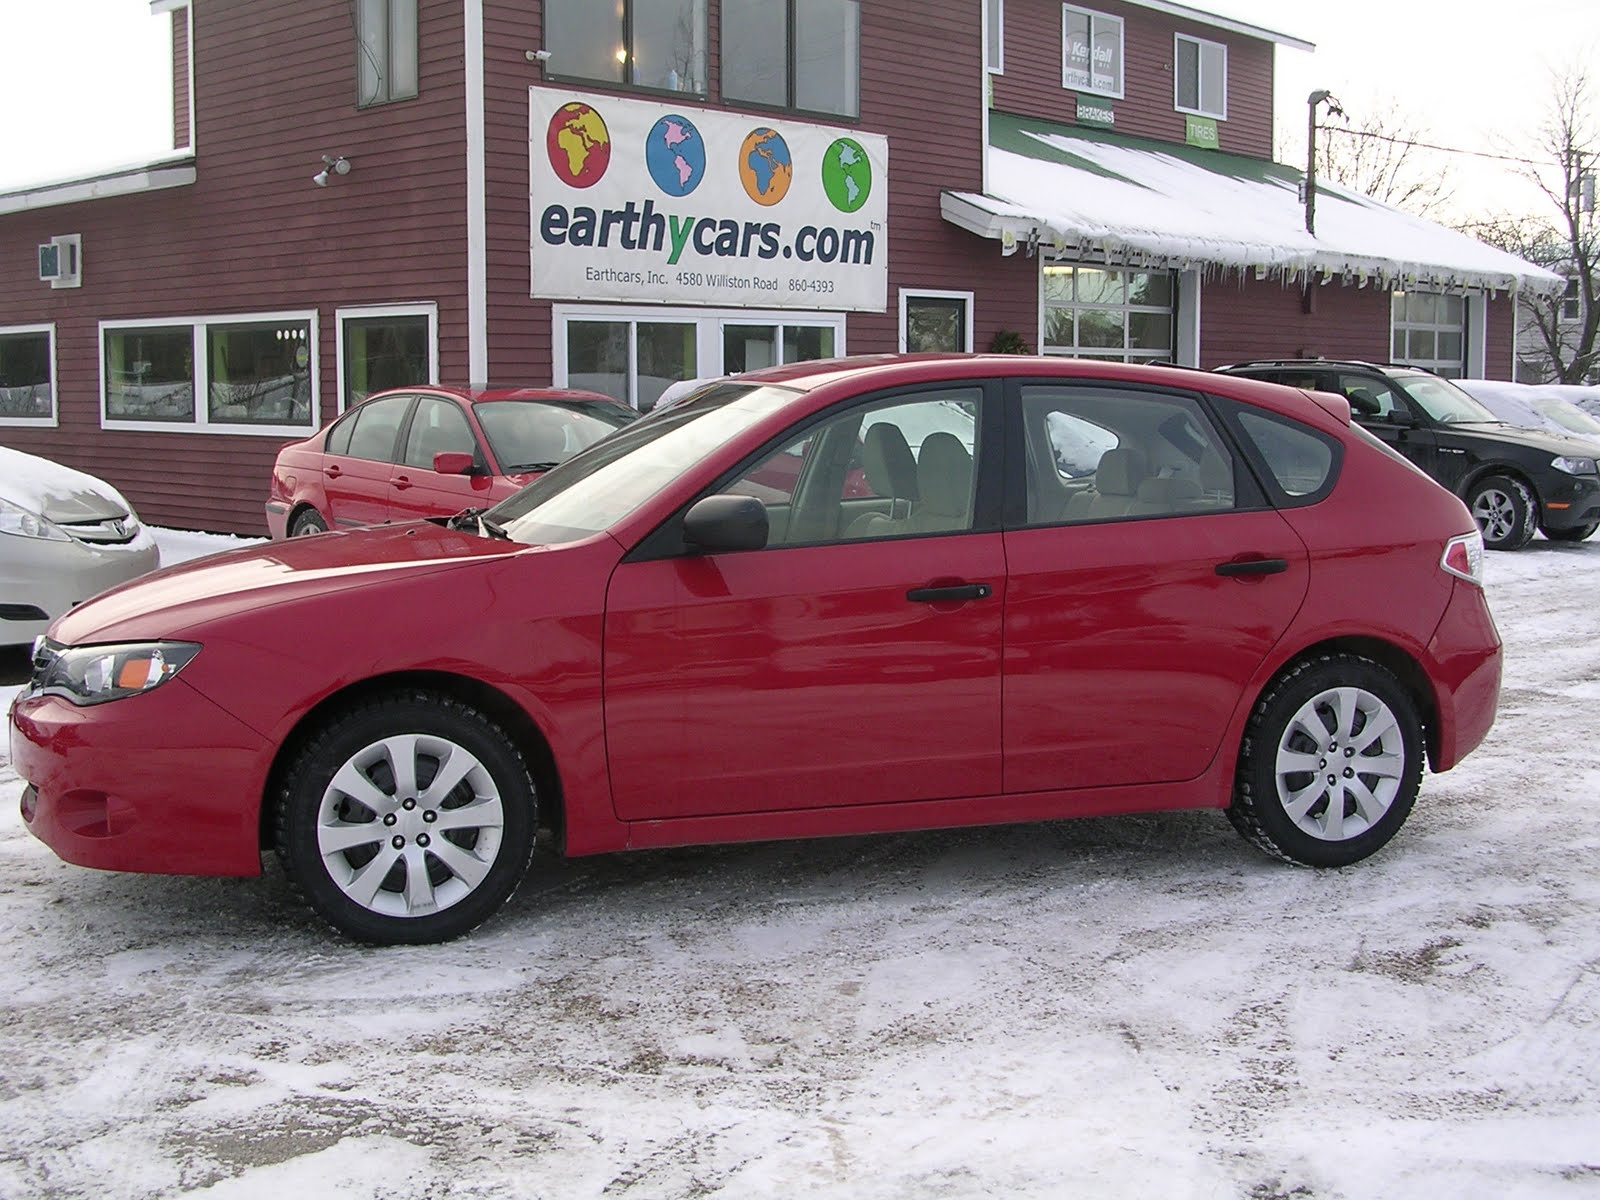 earthy cars blog: earthy car of the week: 2008 red subaru impreza 2.5